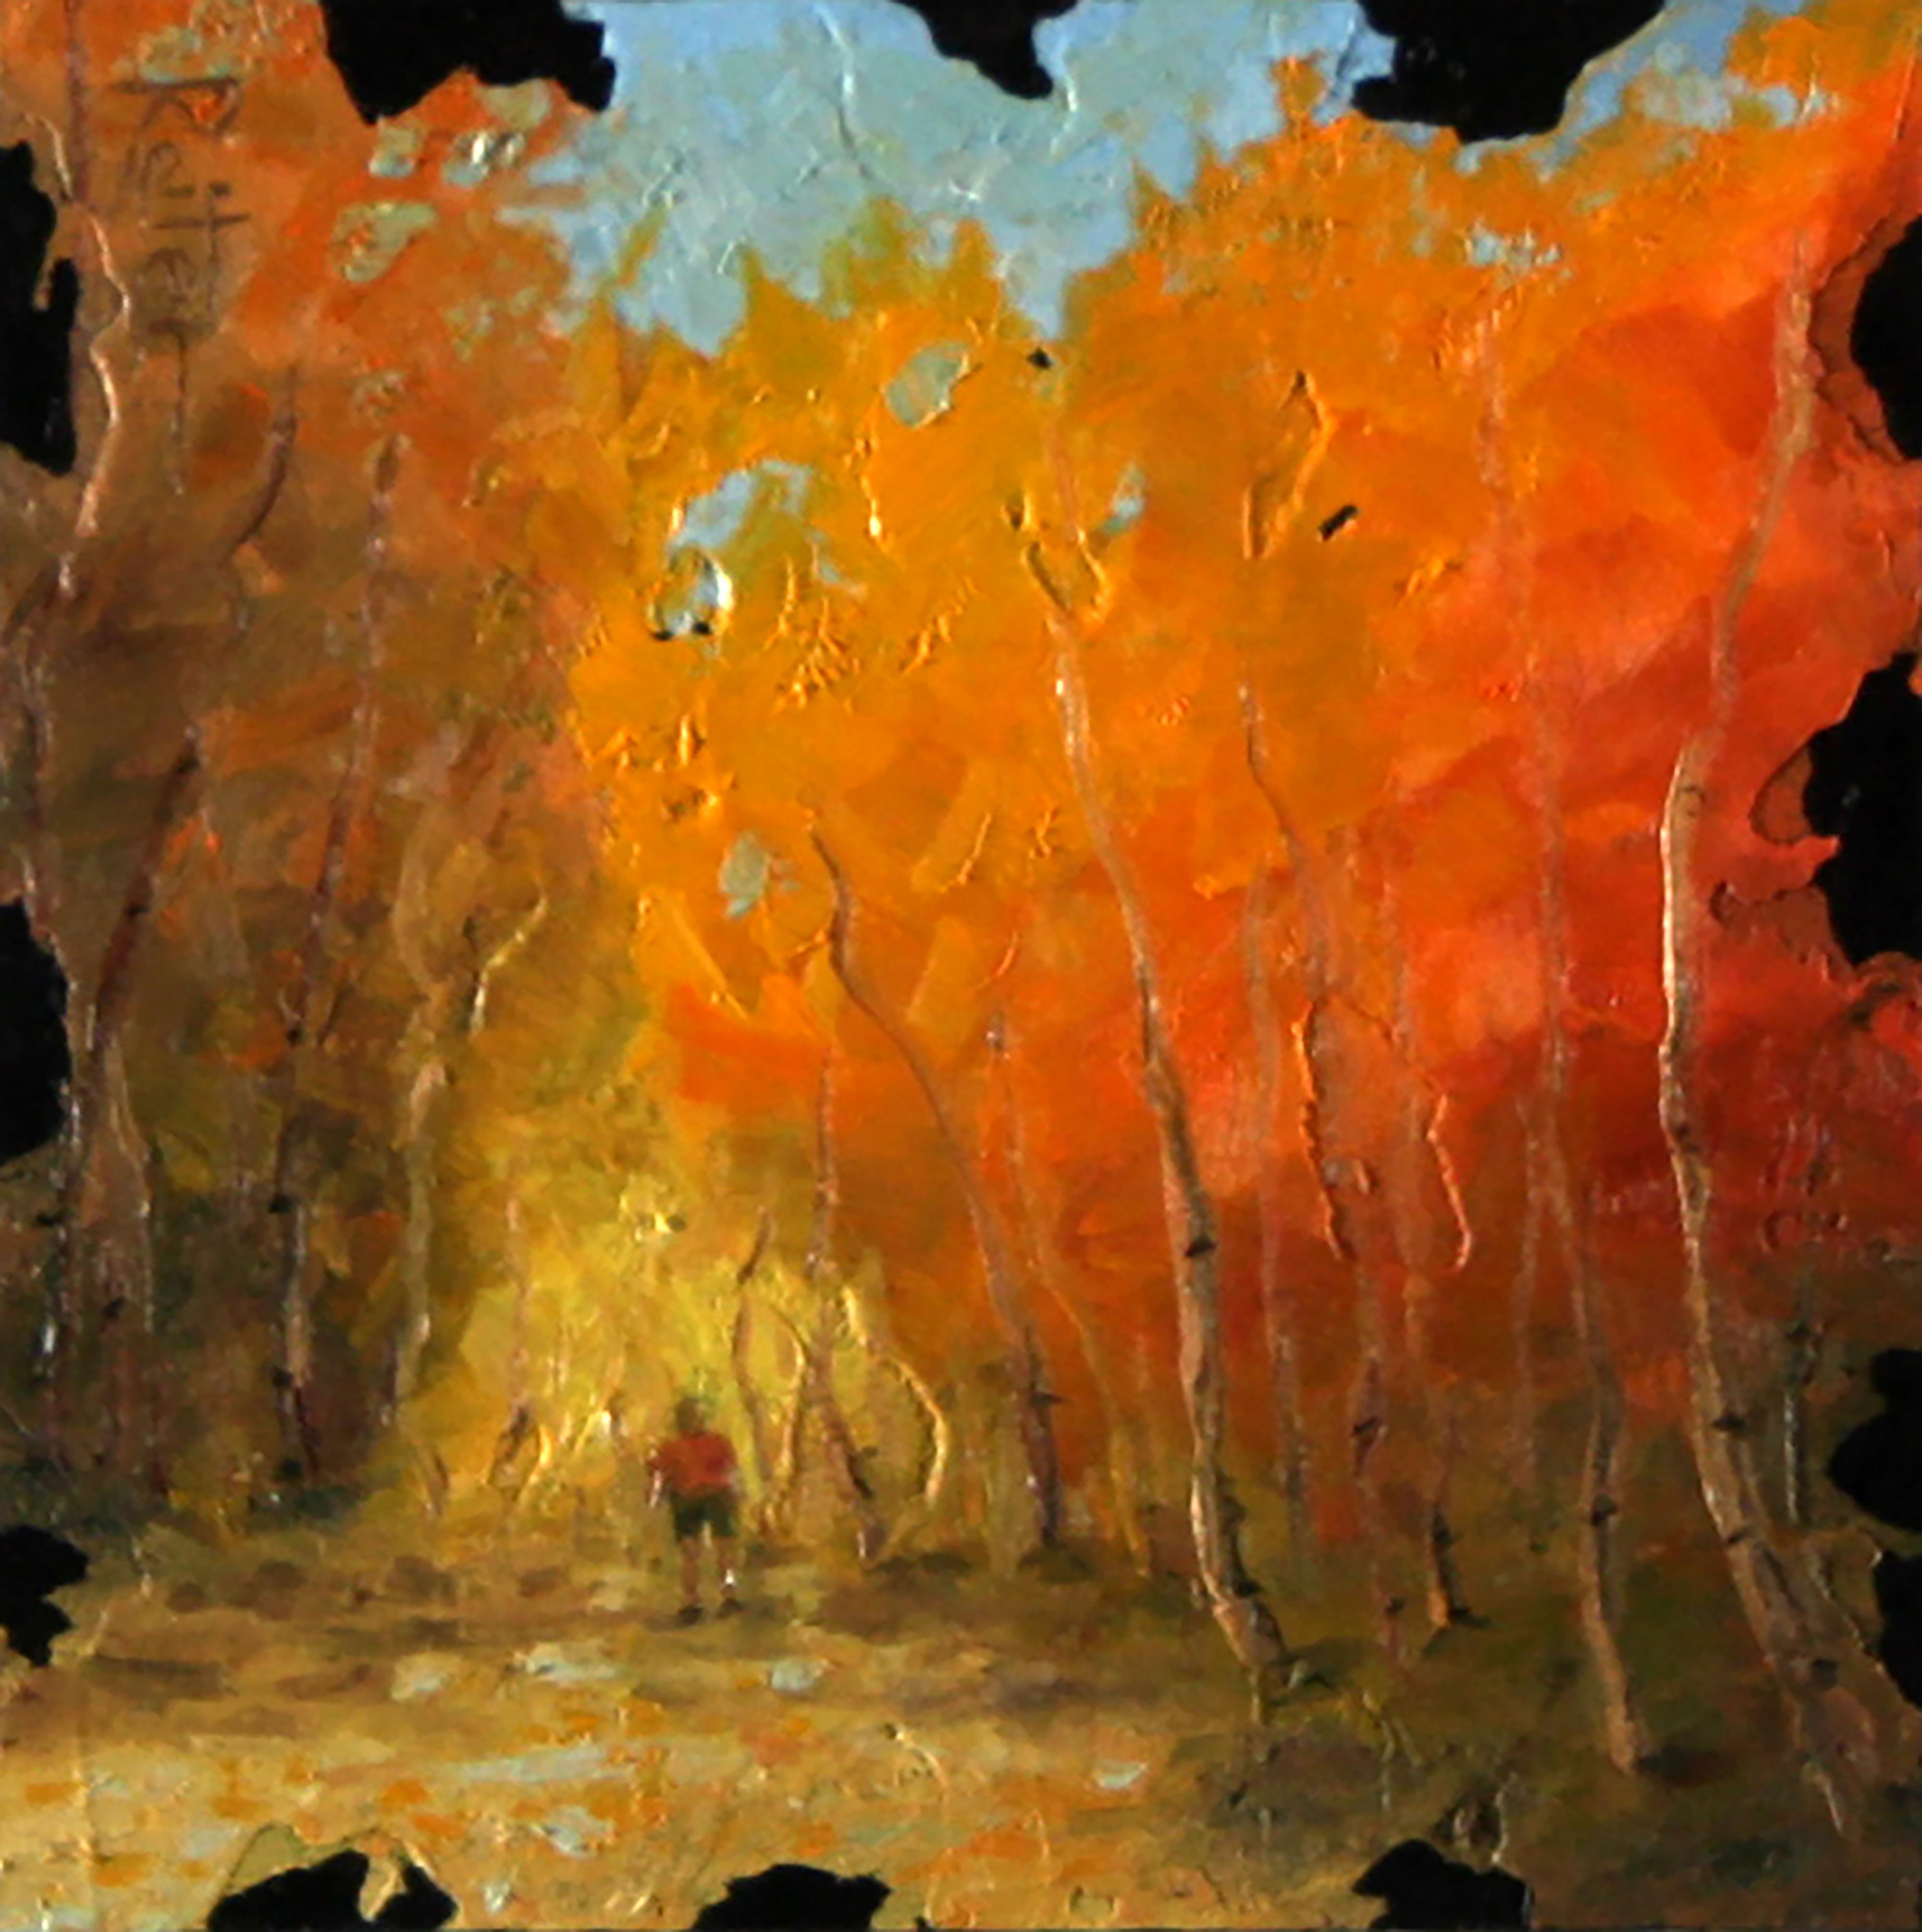 """Aspens XIX"" (19) by Dave Reiter | ArtworkNetwork.com"